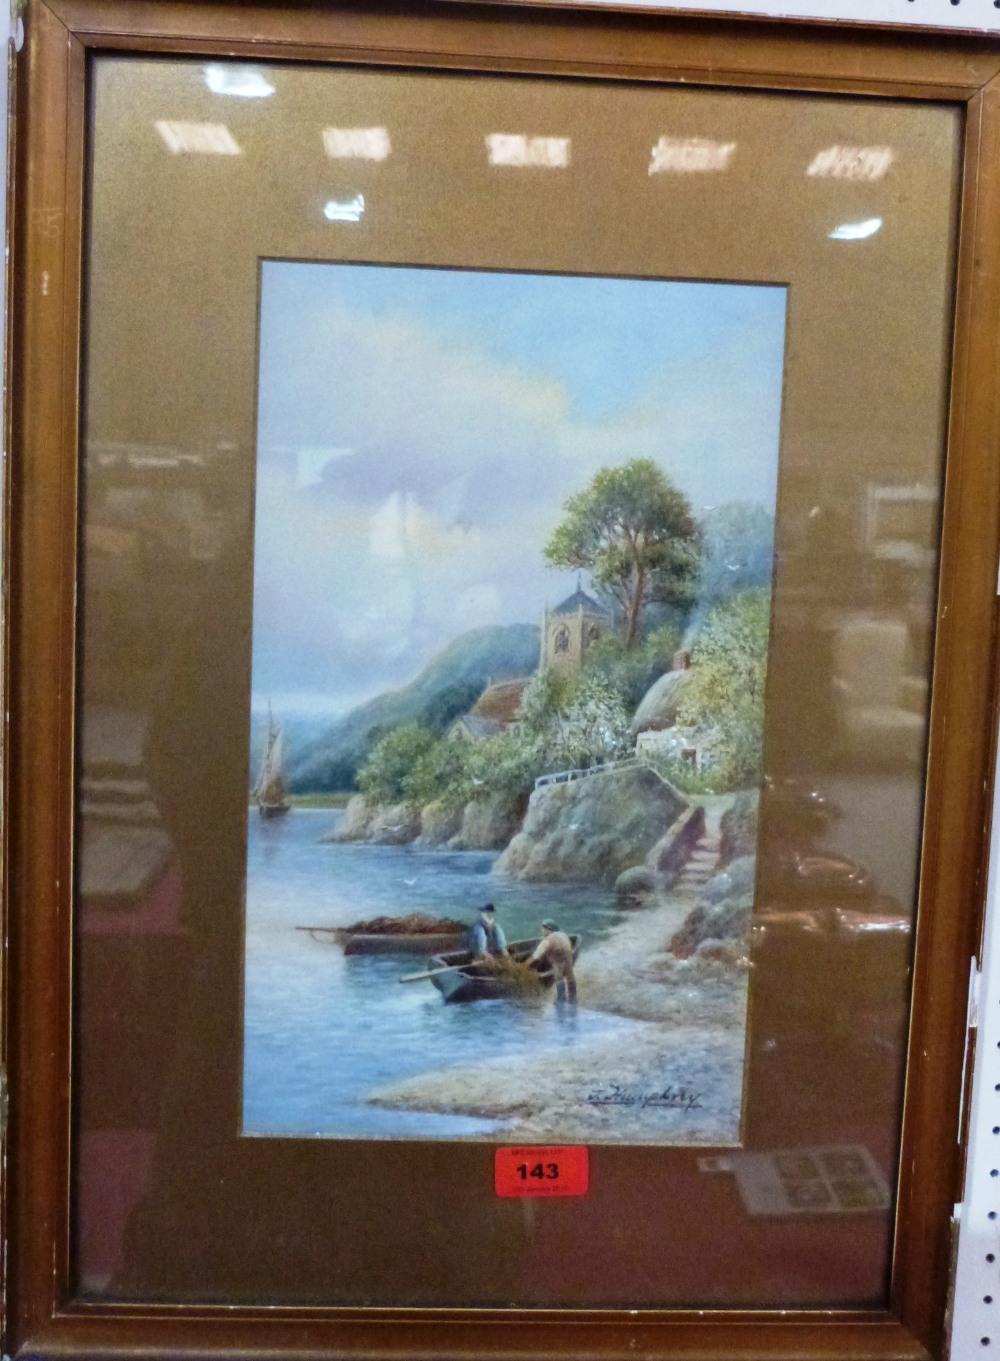 Lot 143 - J. HUMPHREY. BRITISH 20TH CENTURY Lake scene with fishermen. Signed. Watercolour 14' x 8'